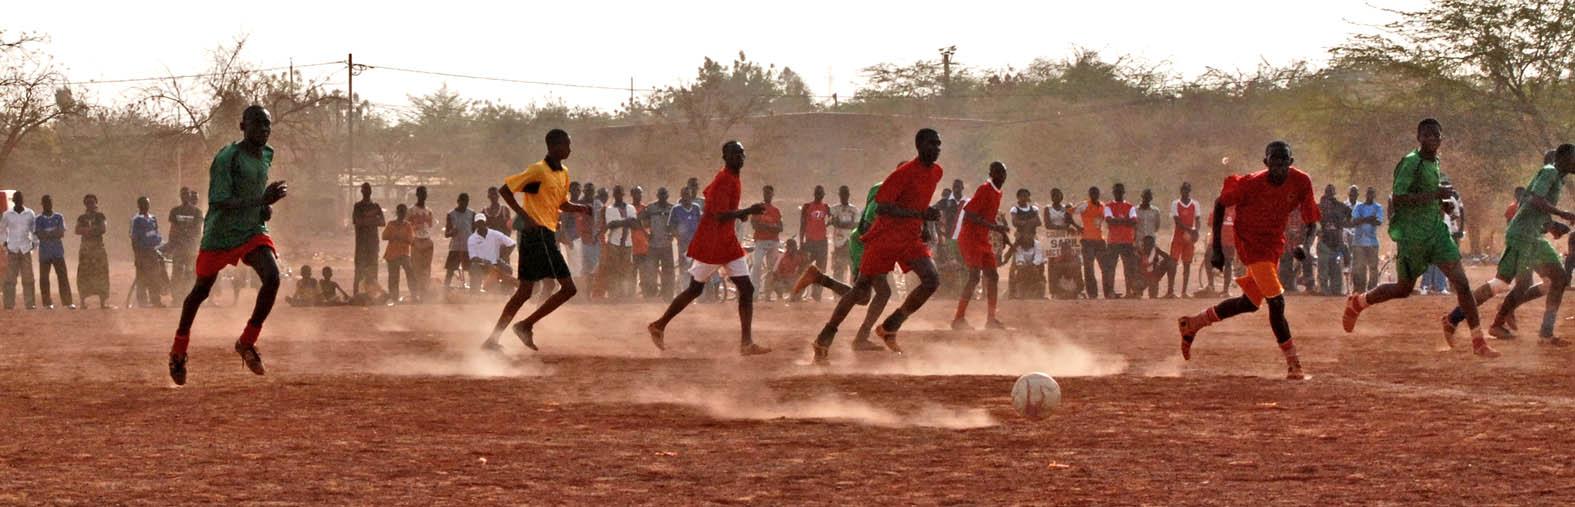 Jugendfußballclub in Ghana (c) Walter Korn